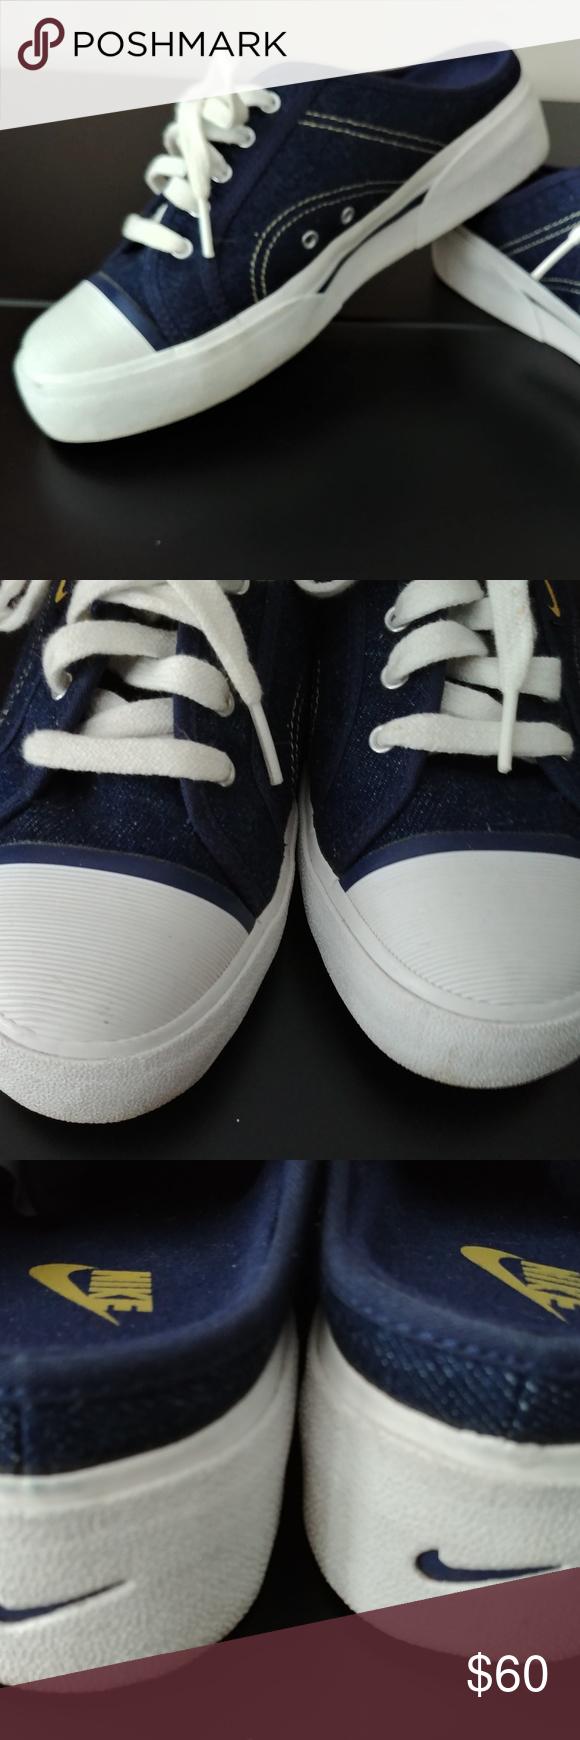 1d9afa5051928 Nike Vintage 90s Hermosa mule Nike Hermosa blue denim slip on mule ...